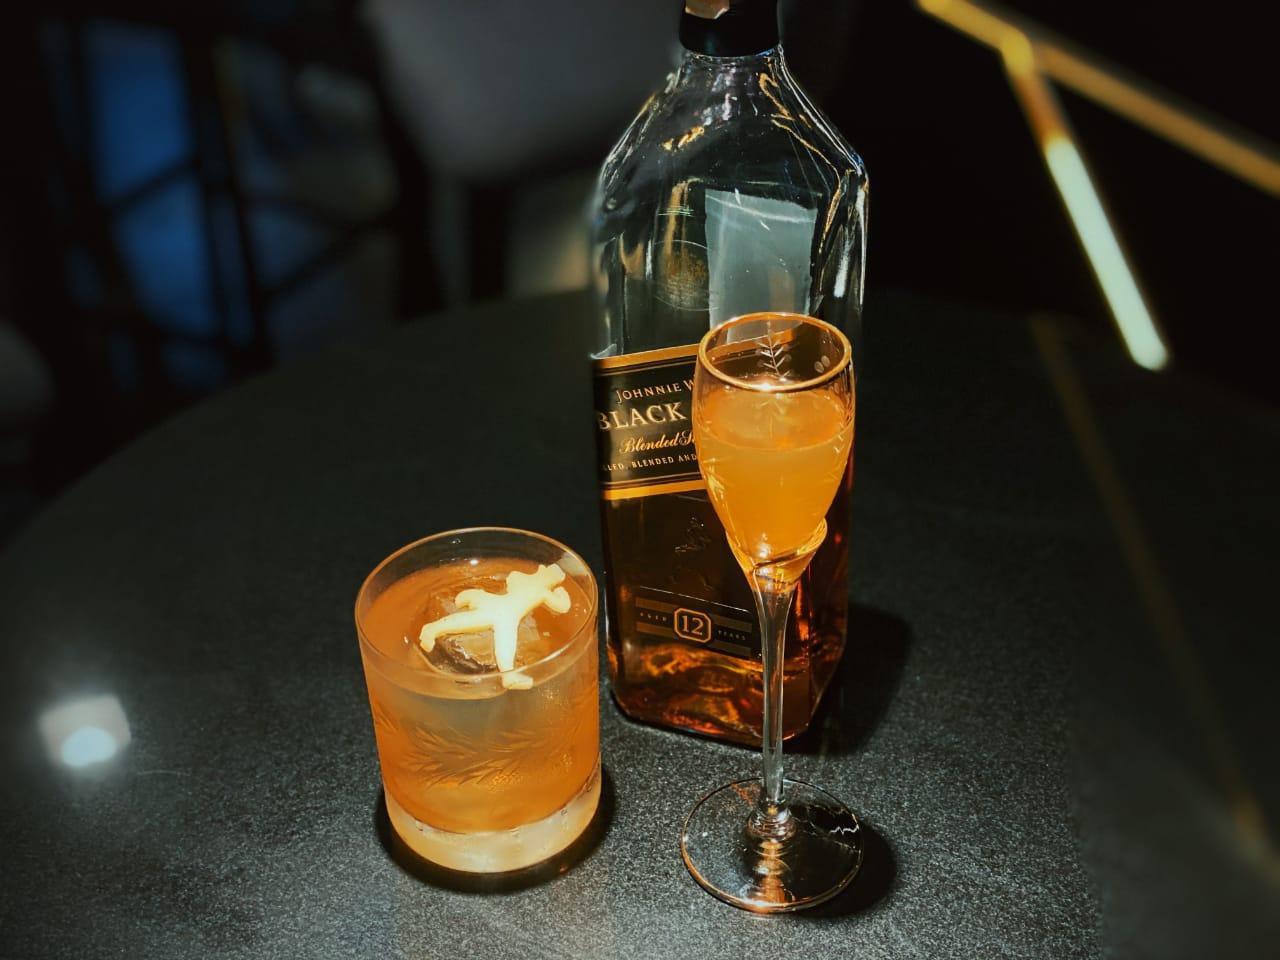 Black Striding, o drinque de Marcelo Yugi Prantoni para o campeonato mundial.